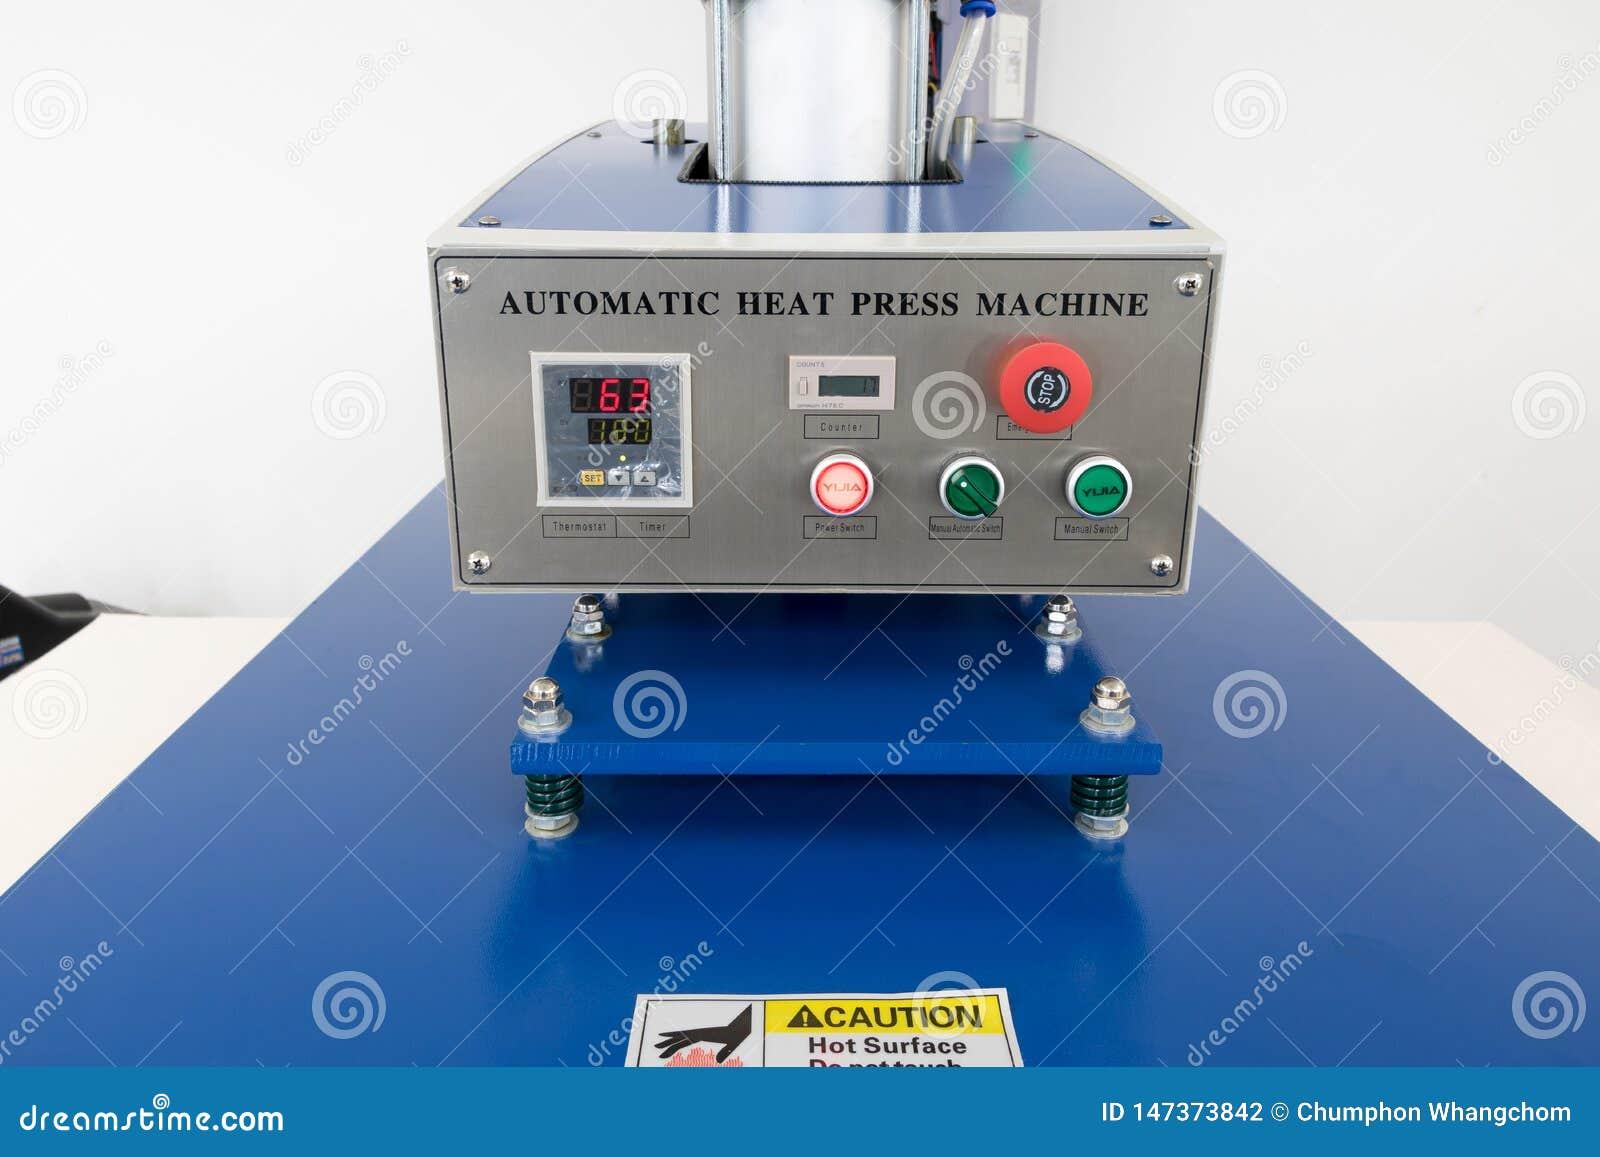 Pathumthani, Thailand - Feb 27, 2017 : Large heat press machine for fabric business in printing factory at Lumlukka, pathumthani